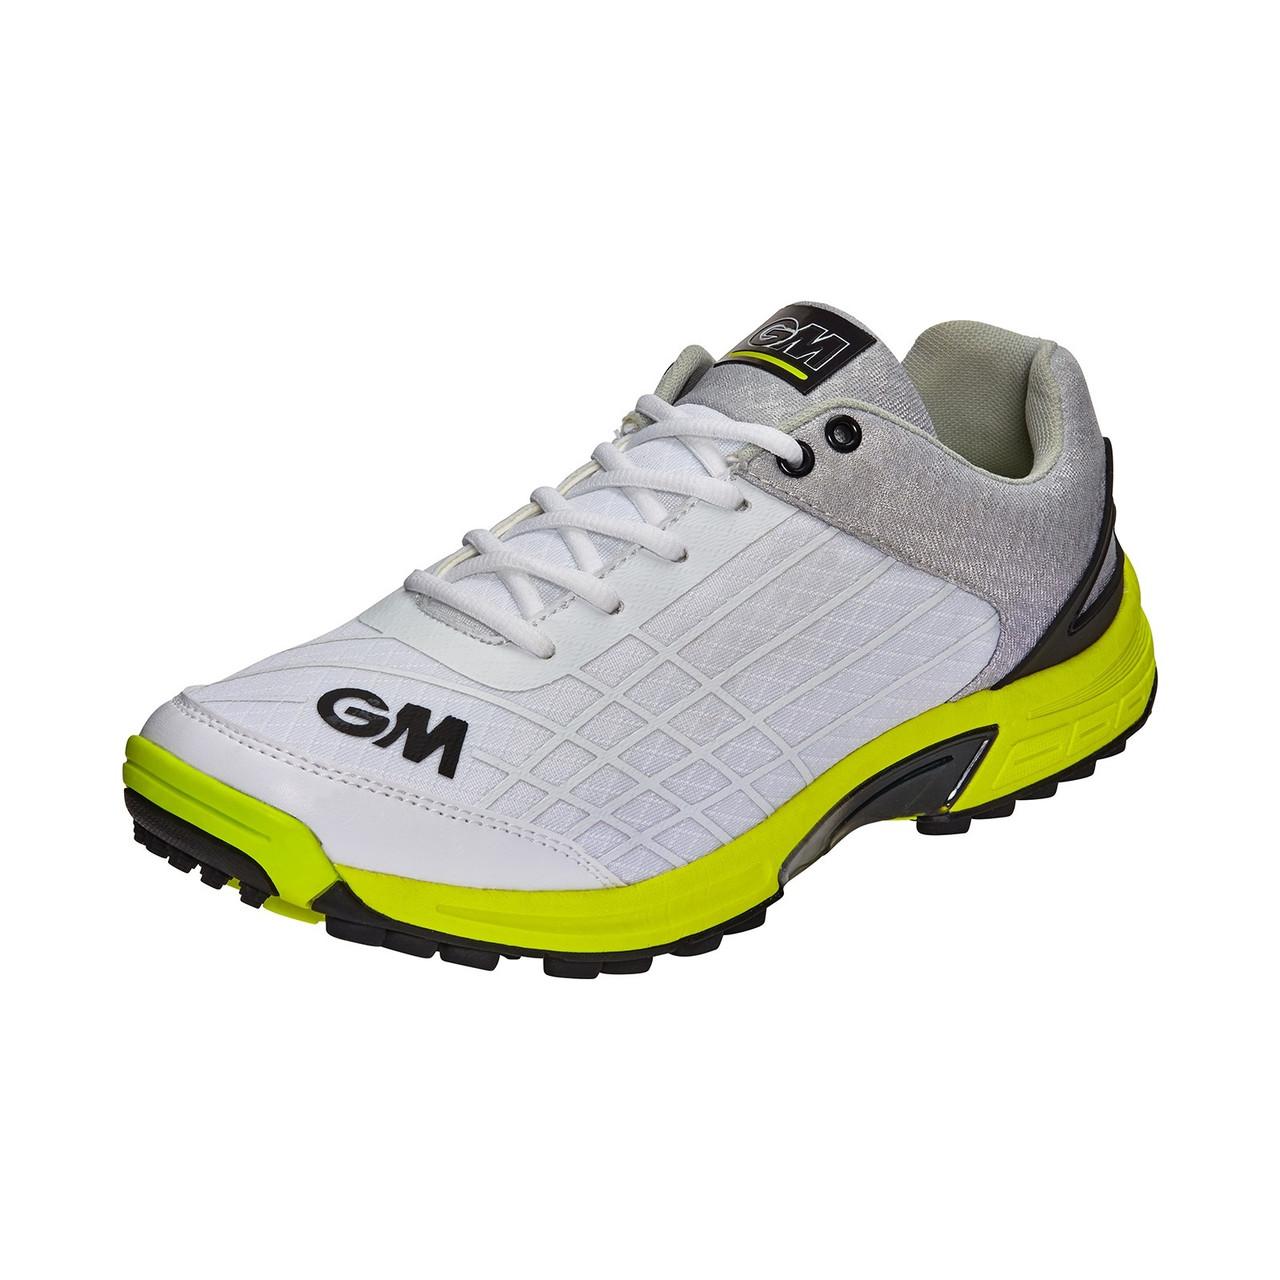 GM Original All Rounder Cricket Shoes 2019